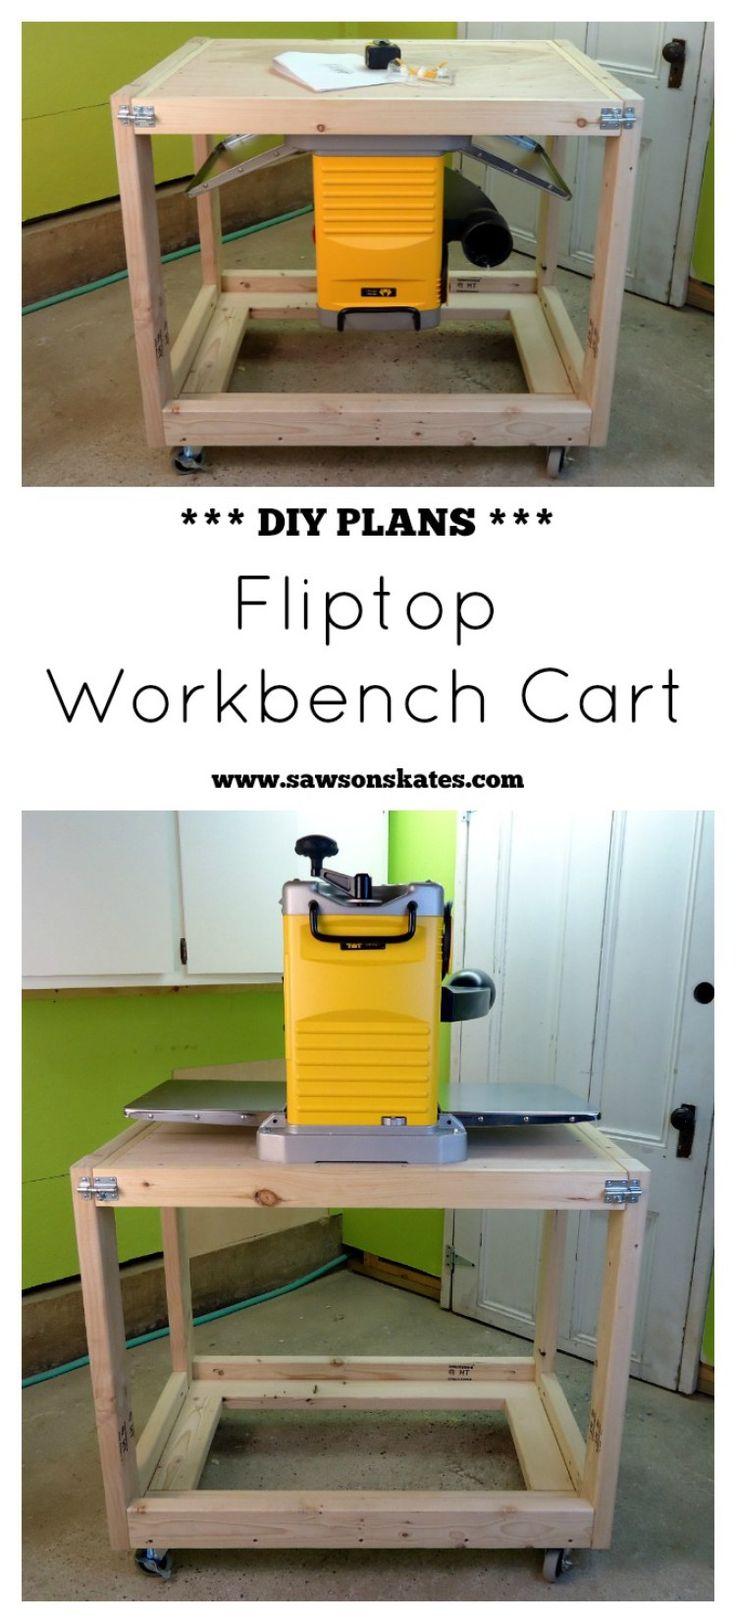 DIY Fliptop Workbench Cart made with 2x4s - free plans at www.sawsonskates.com